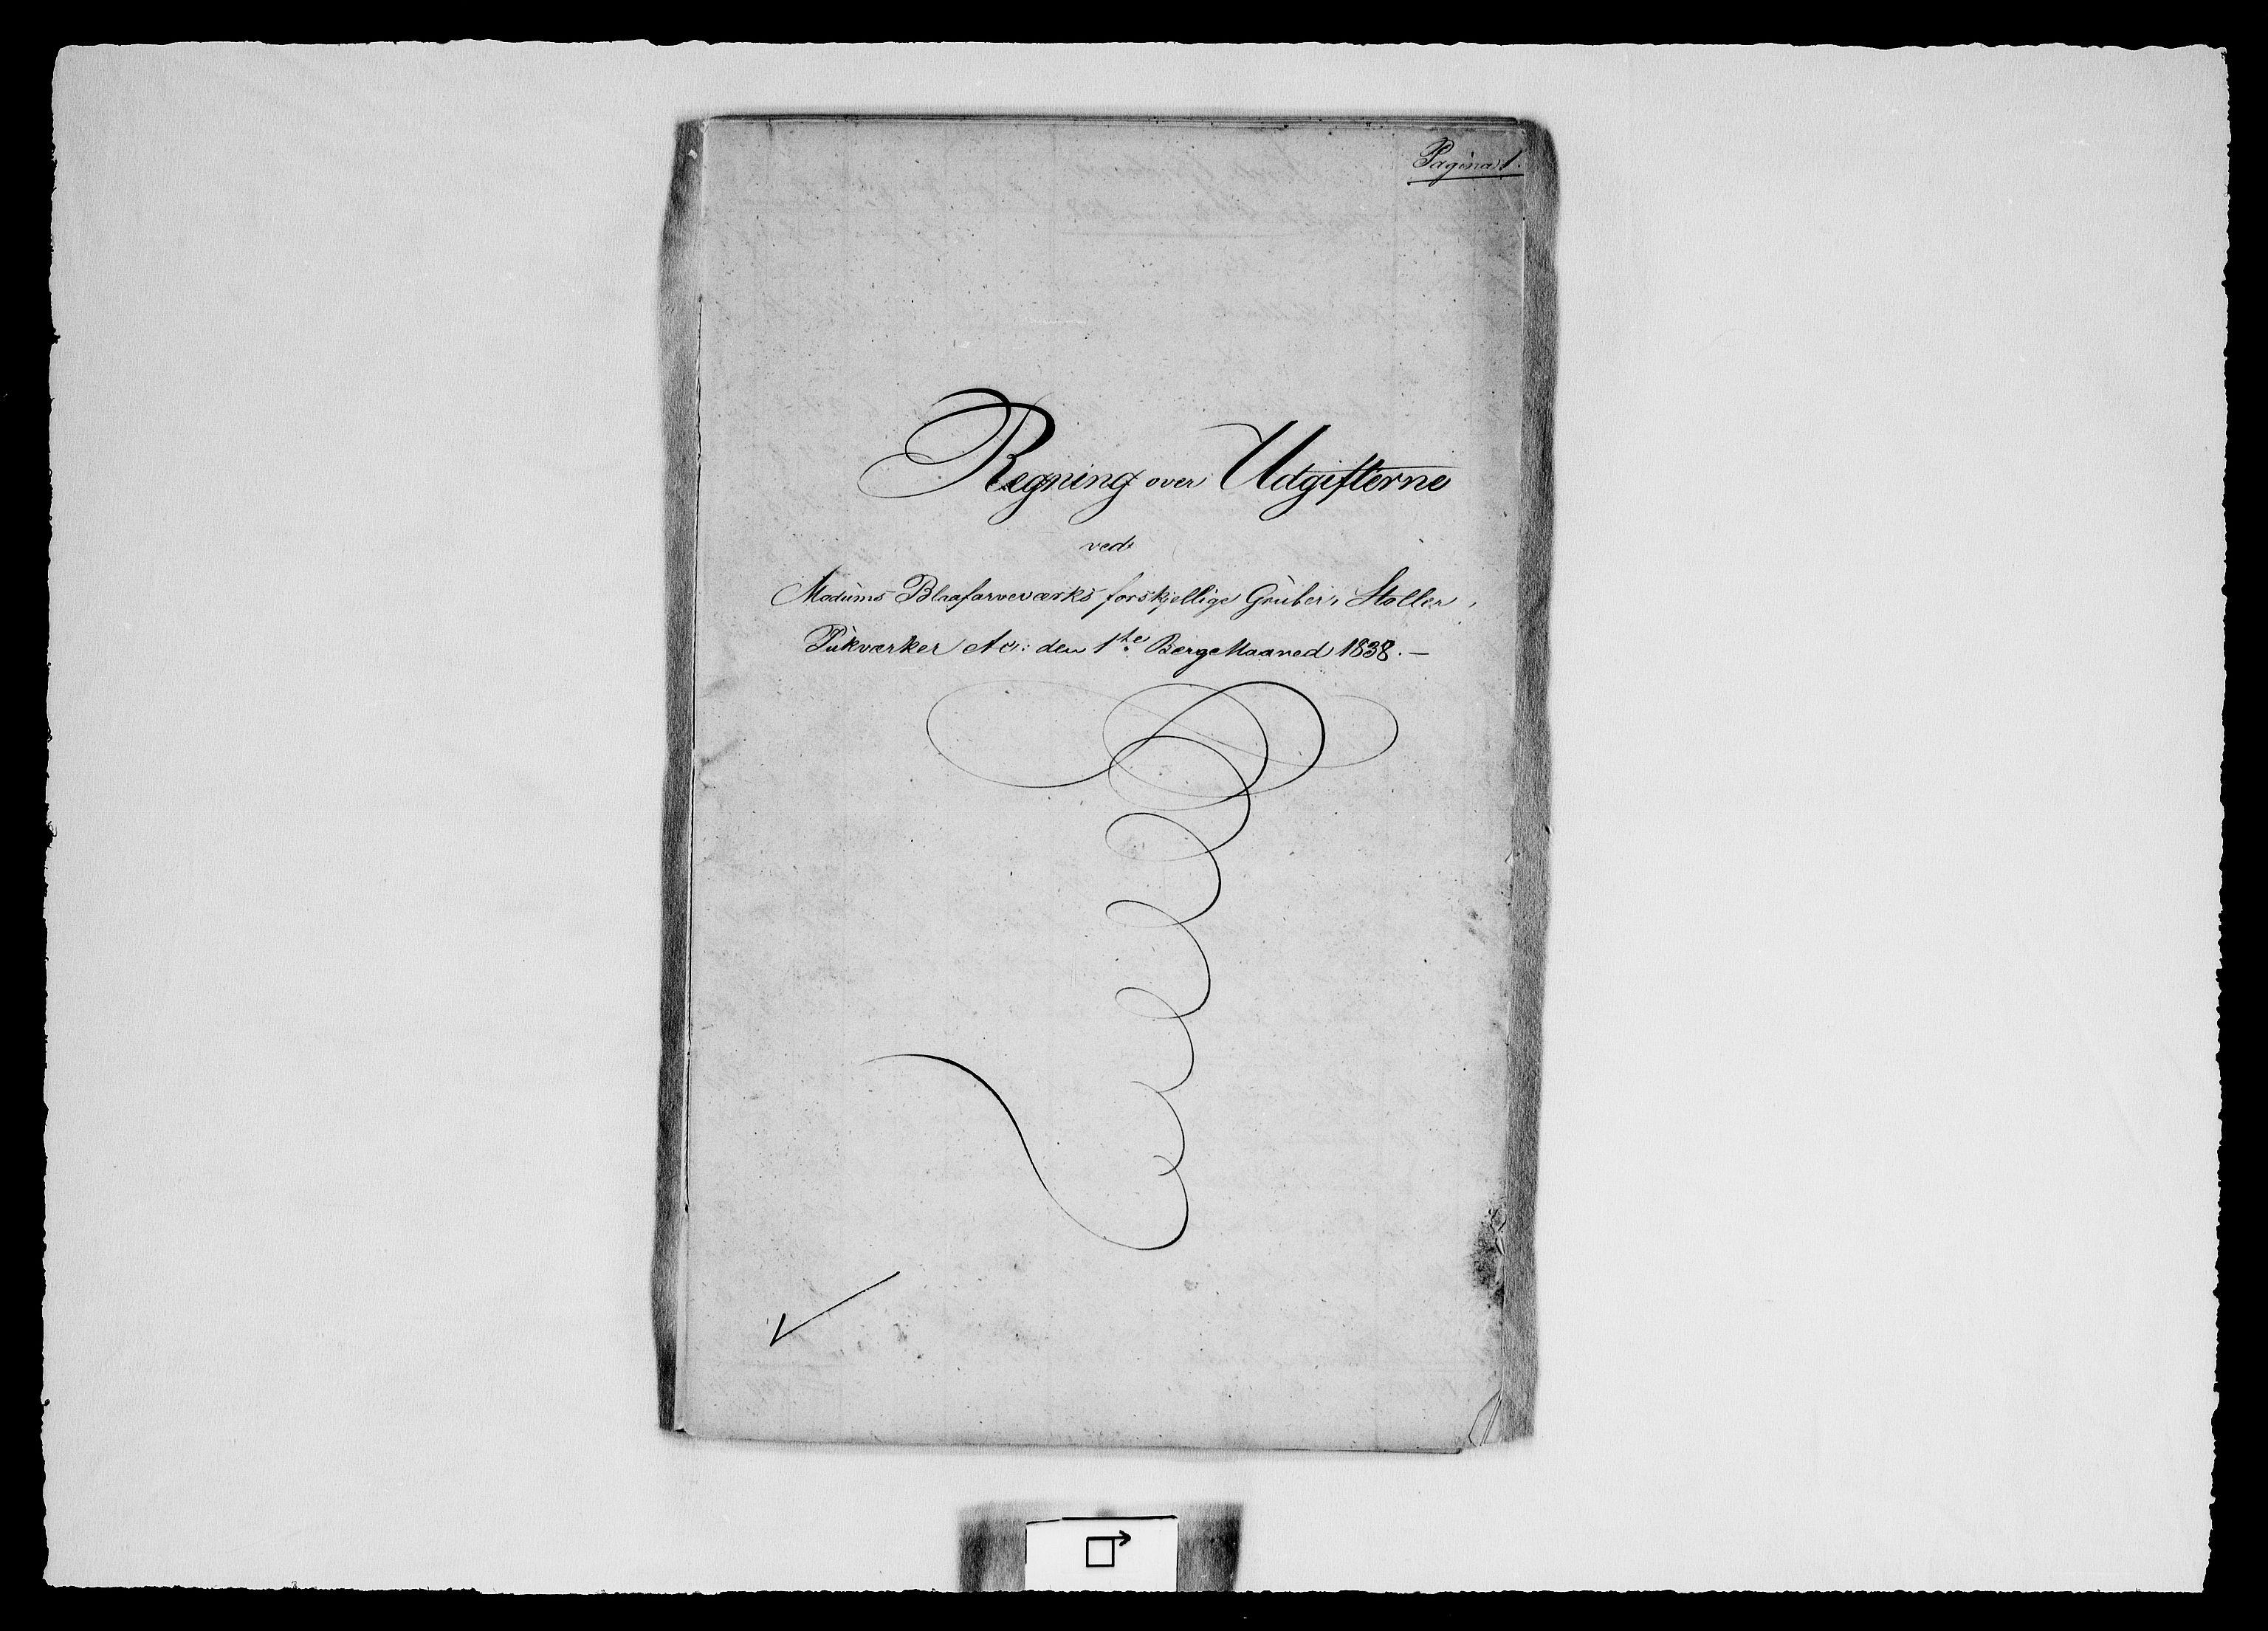 RA, Modums Blaafarveværk, G/Gd/Gdd/L0264, 1838, s. 2